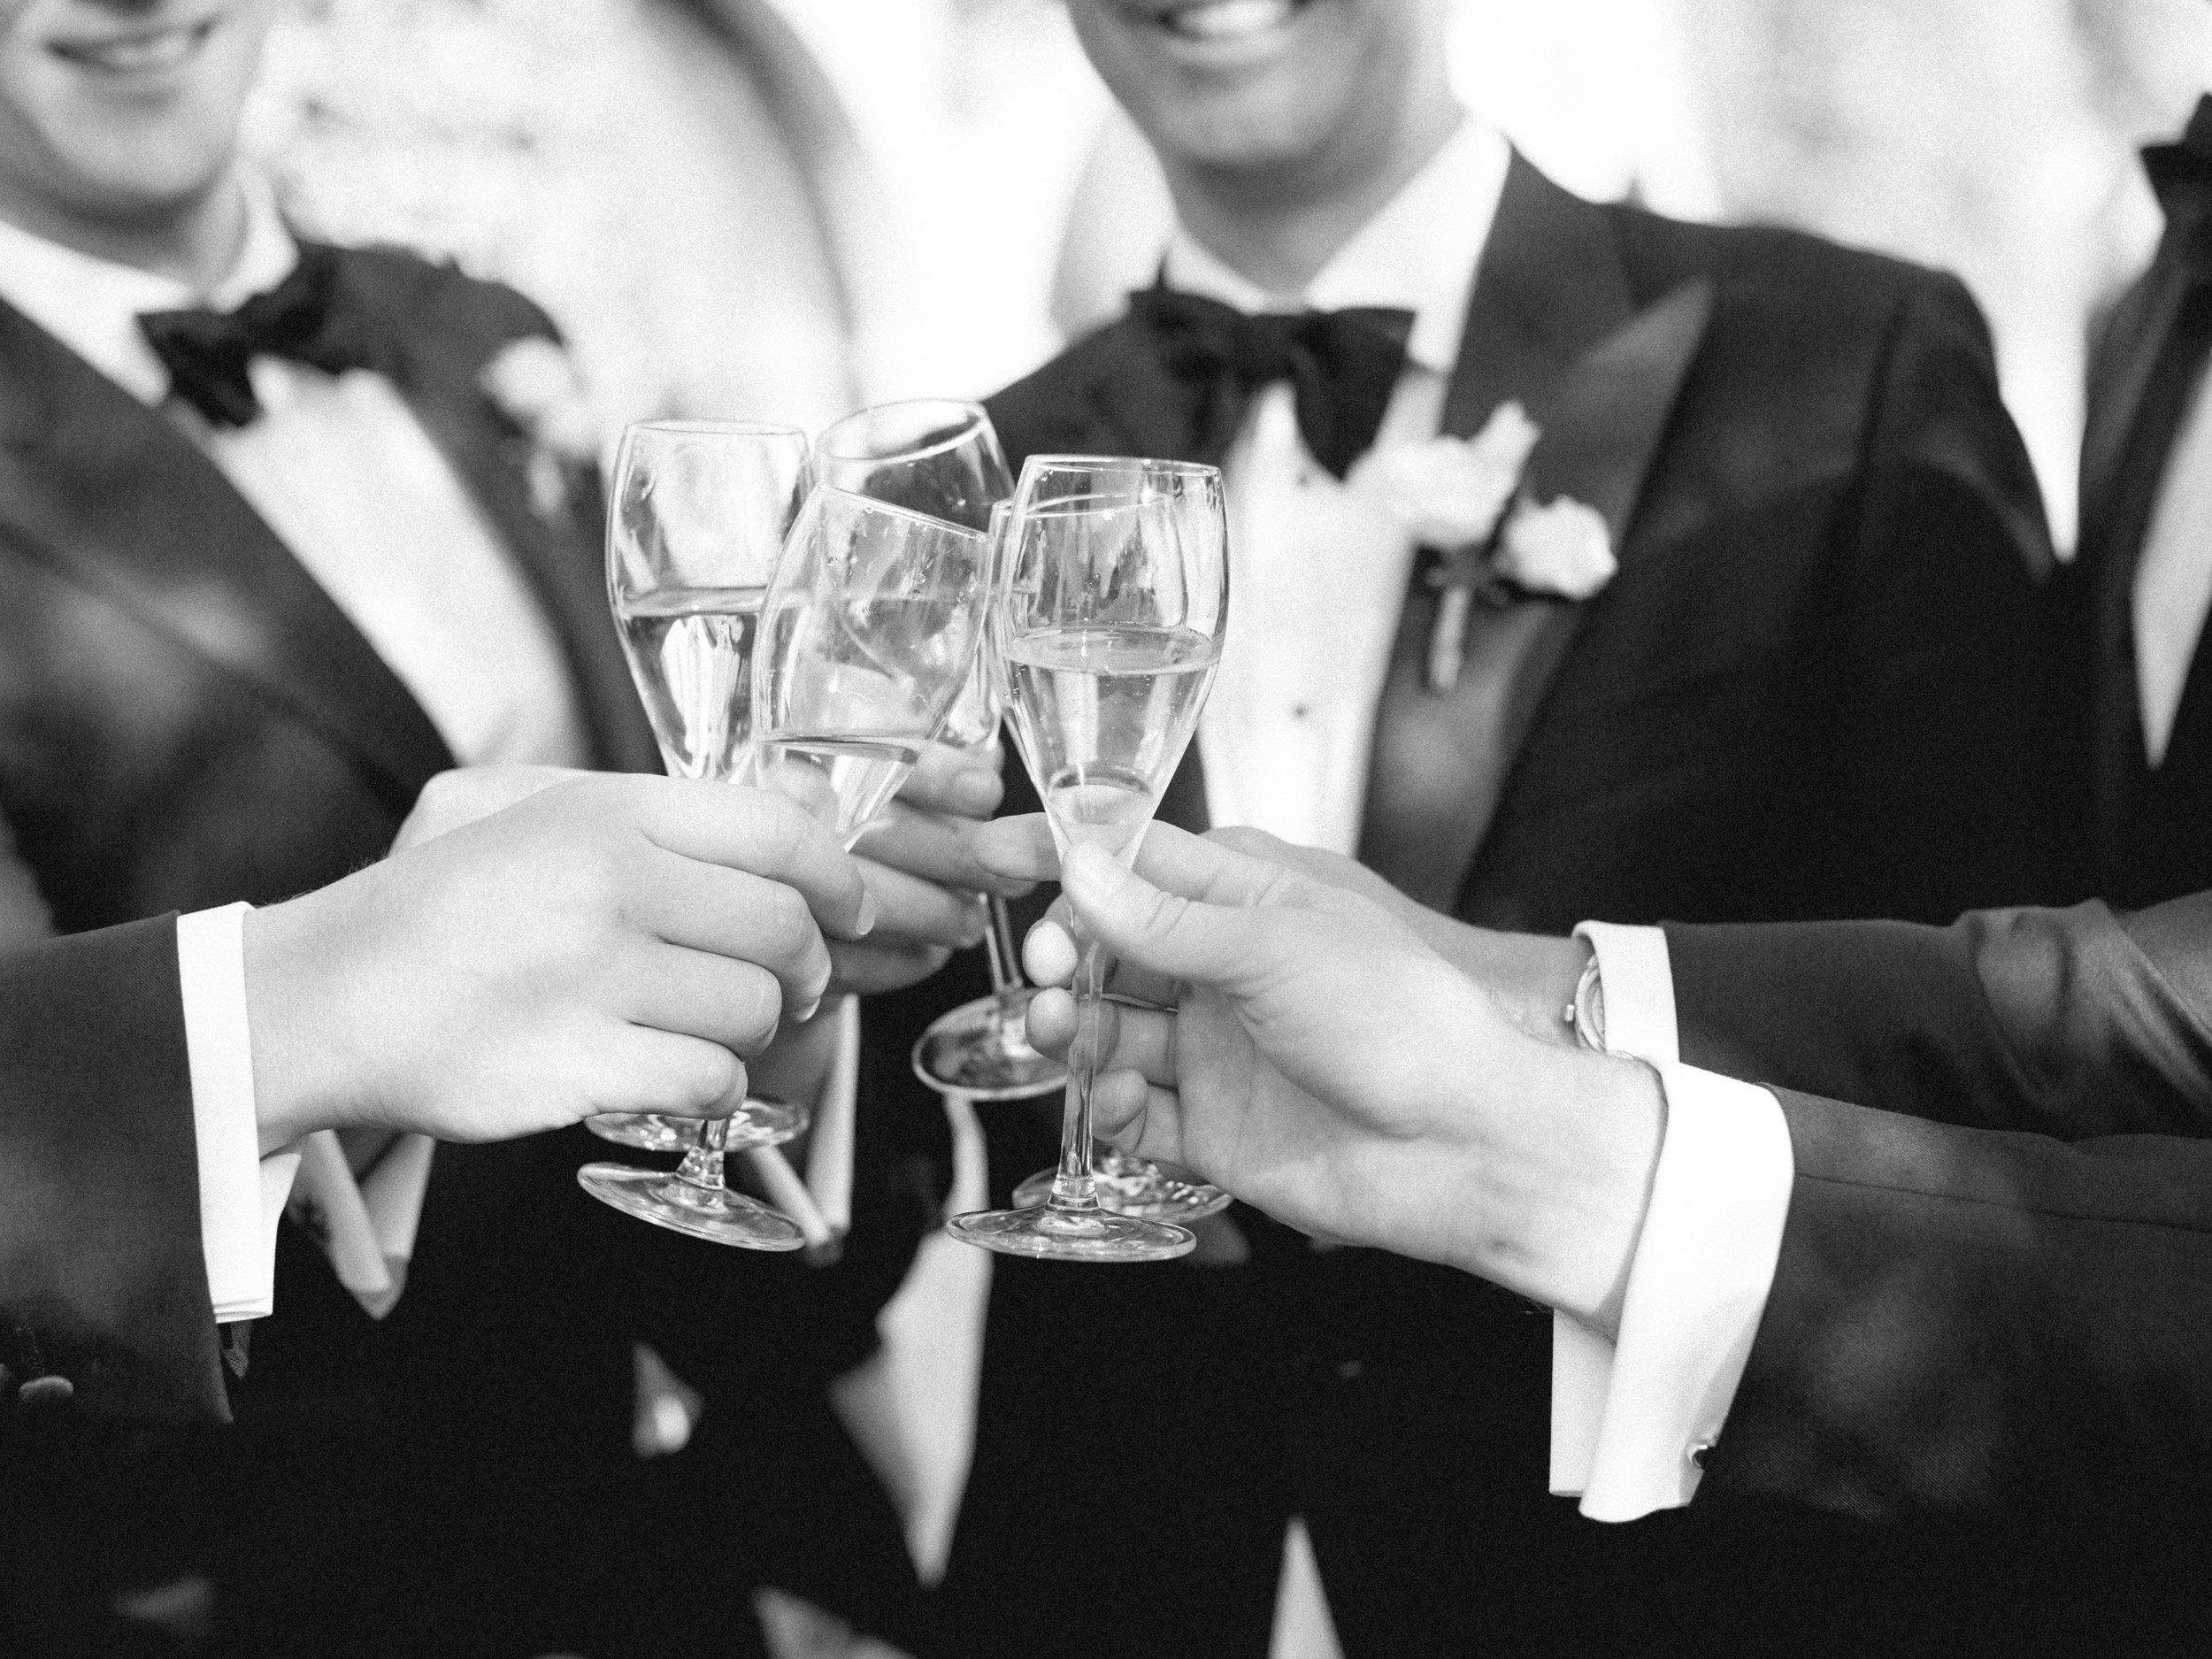 bastide_de_gordes_provence_wedding_(c)_rory-wylie-41.jpg